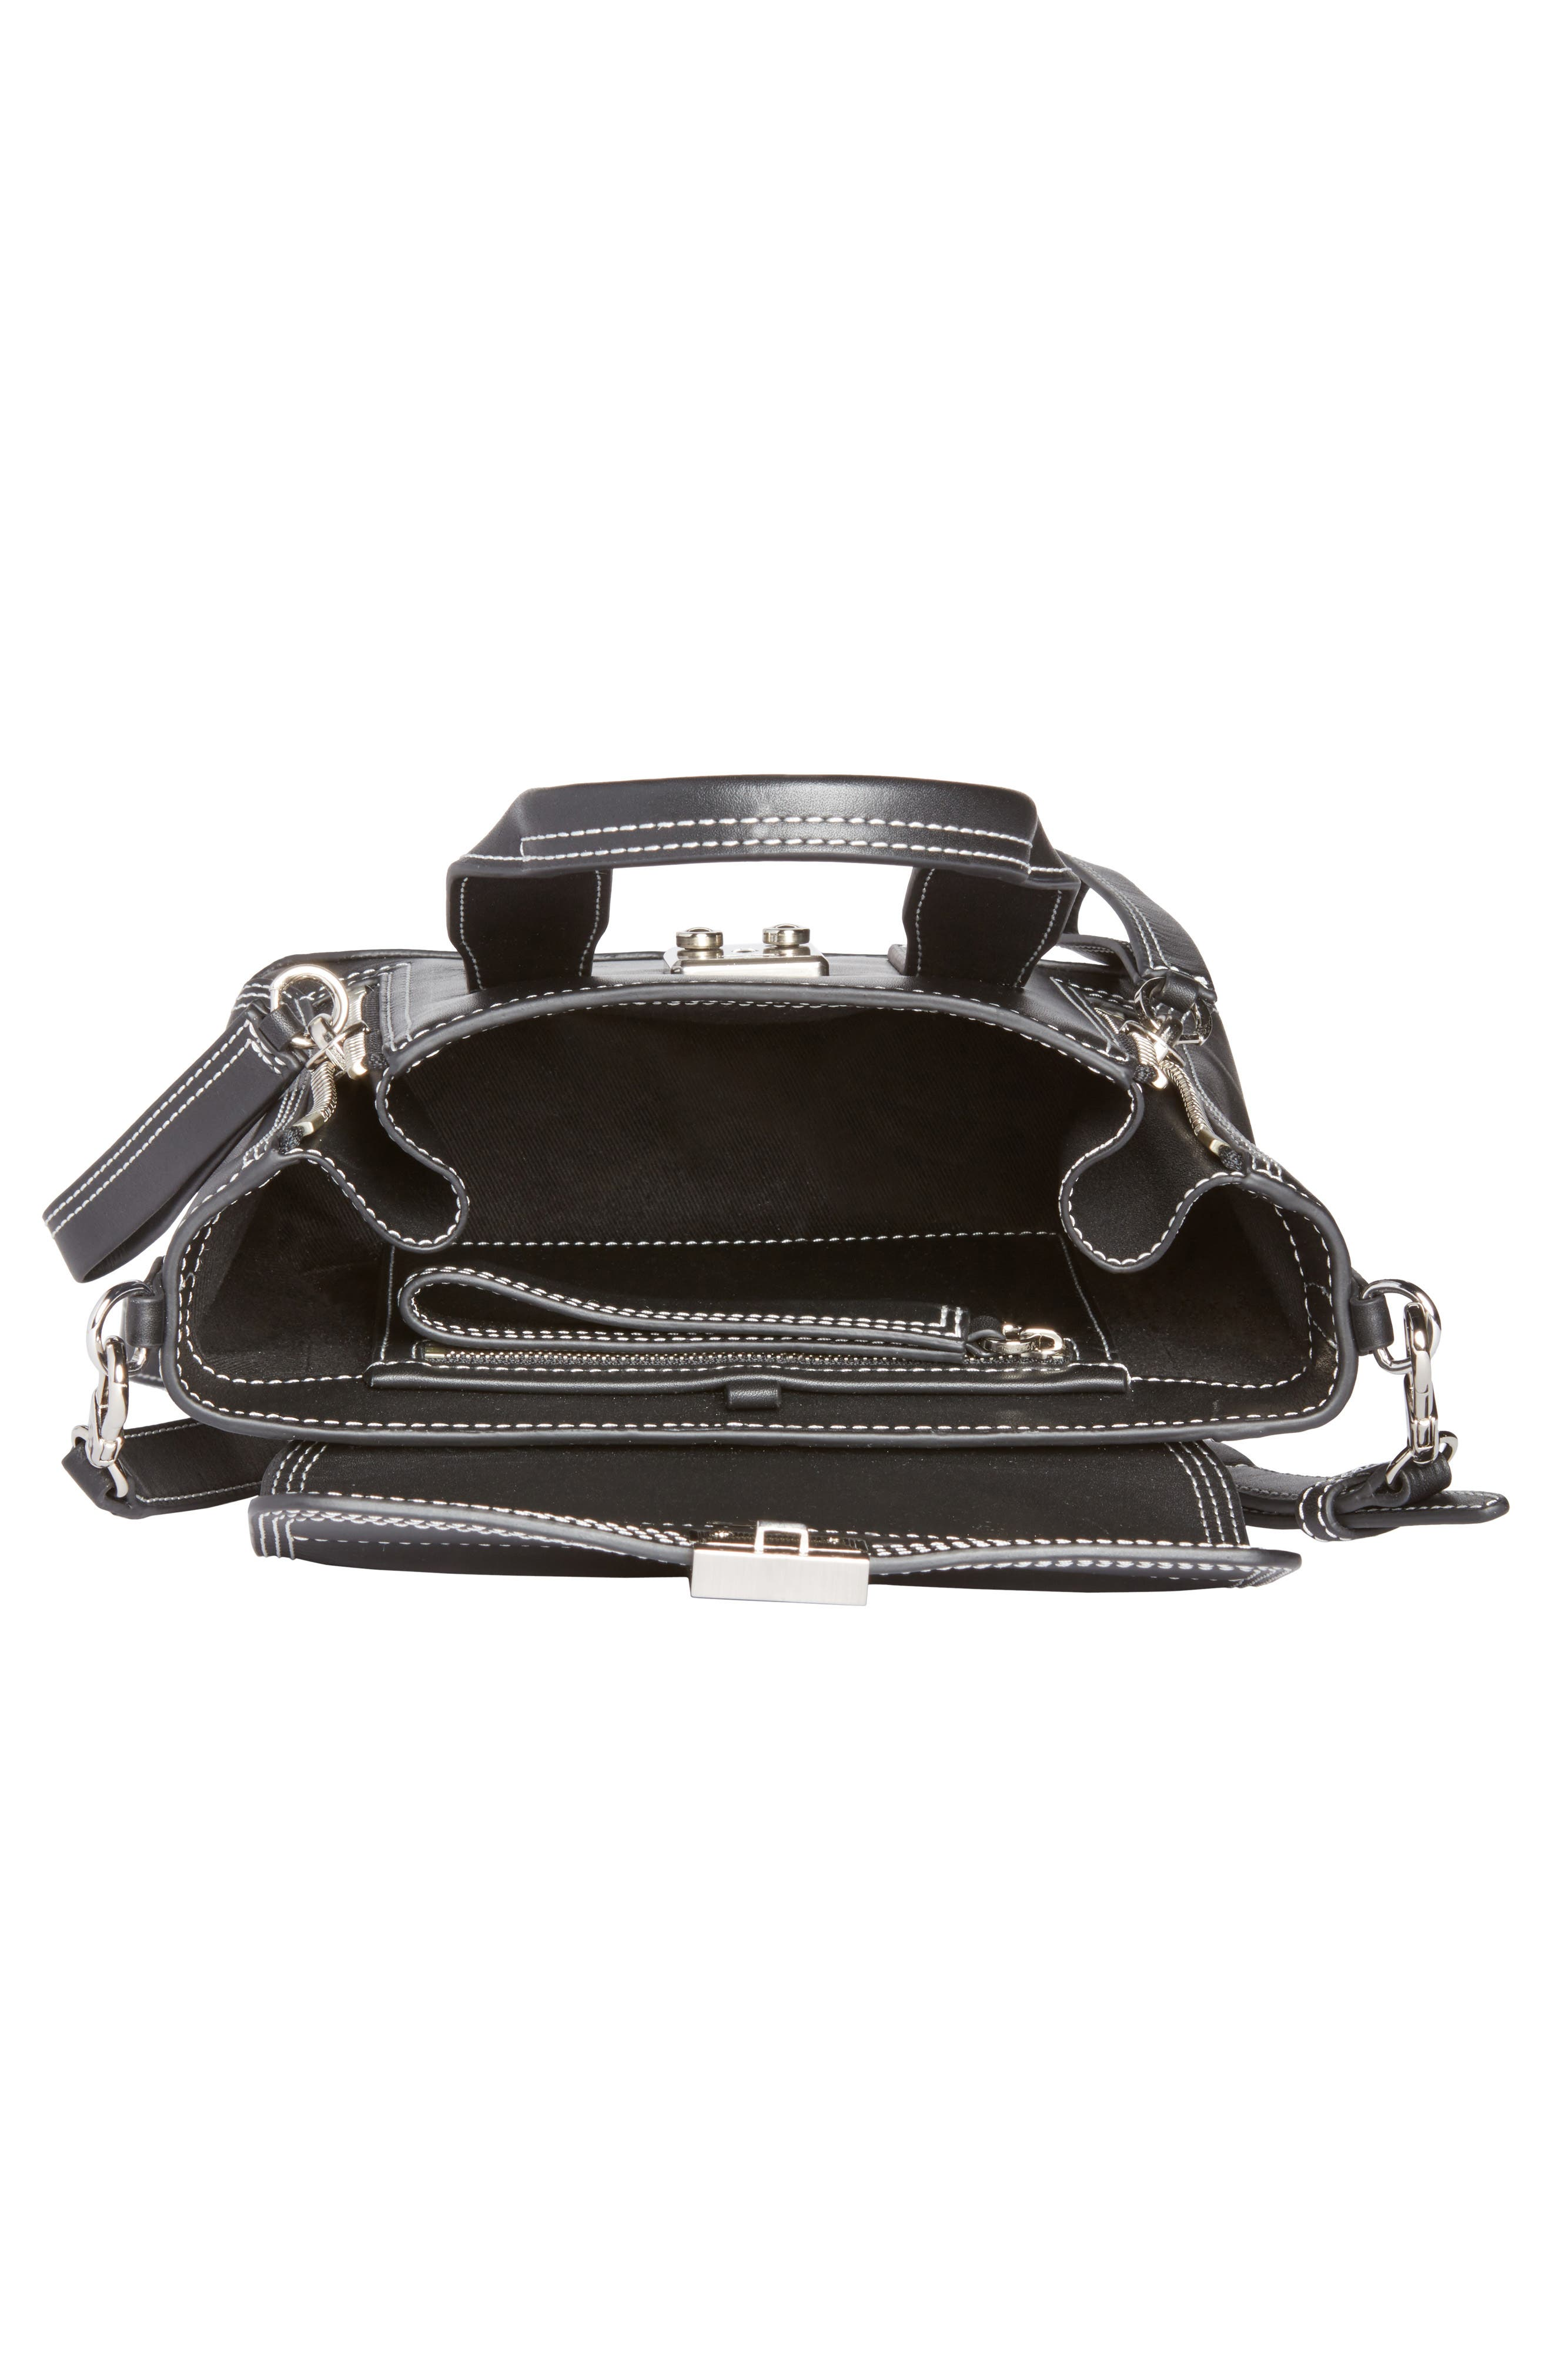 Alternate Image 3  - 3.1 Phillip Lim Mini Pashli Leather Satchel